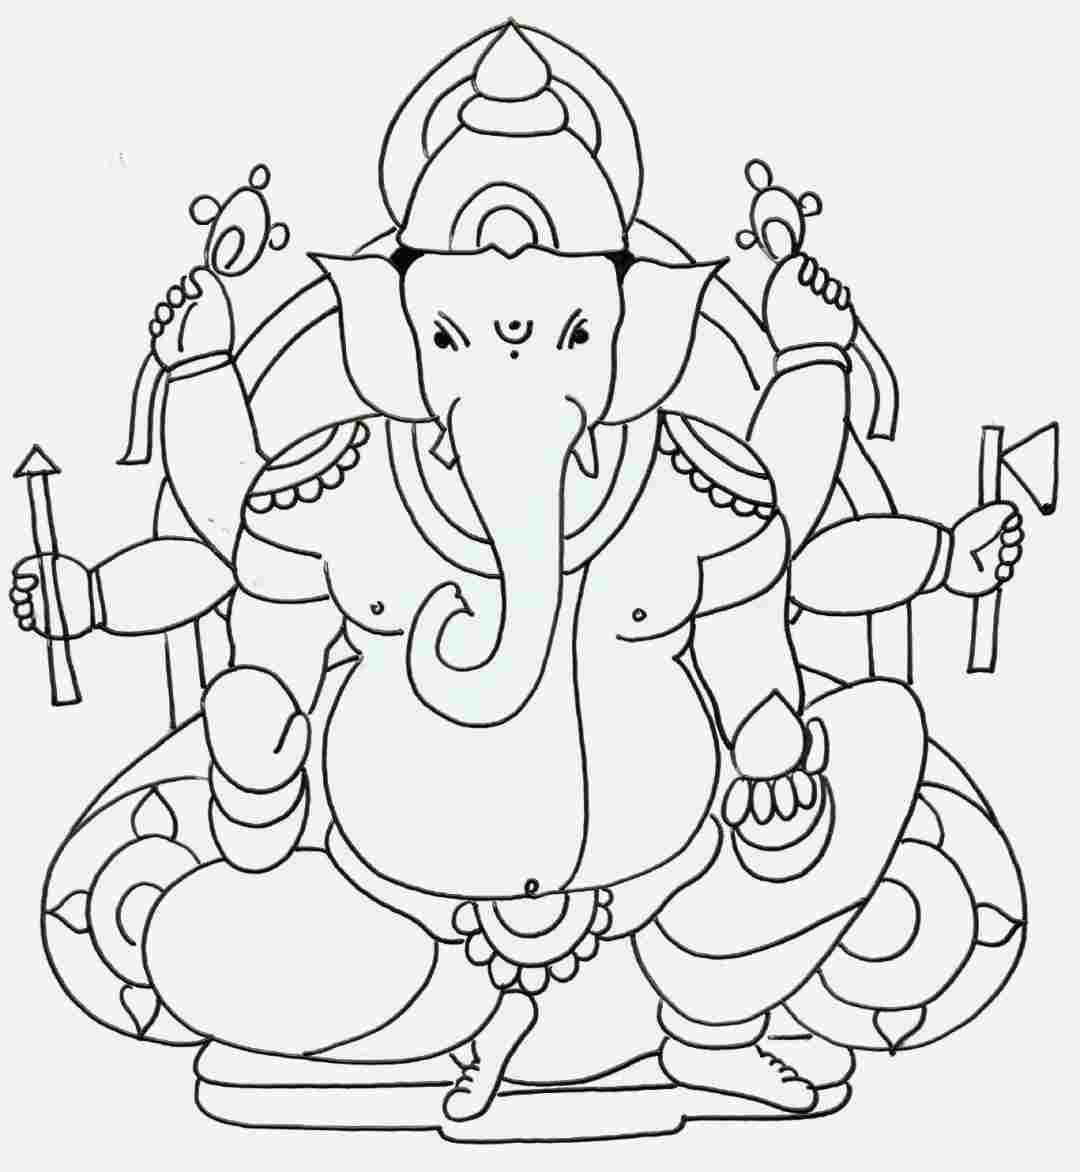 Ganesh Ji Drawing Simple Easy Ganesh Drawing In 2020 Art Drawings Ganesha Art